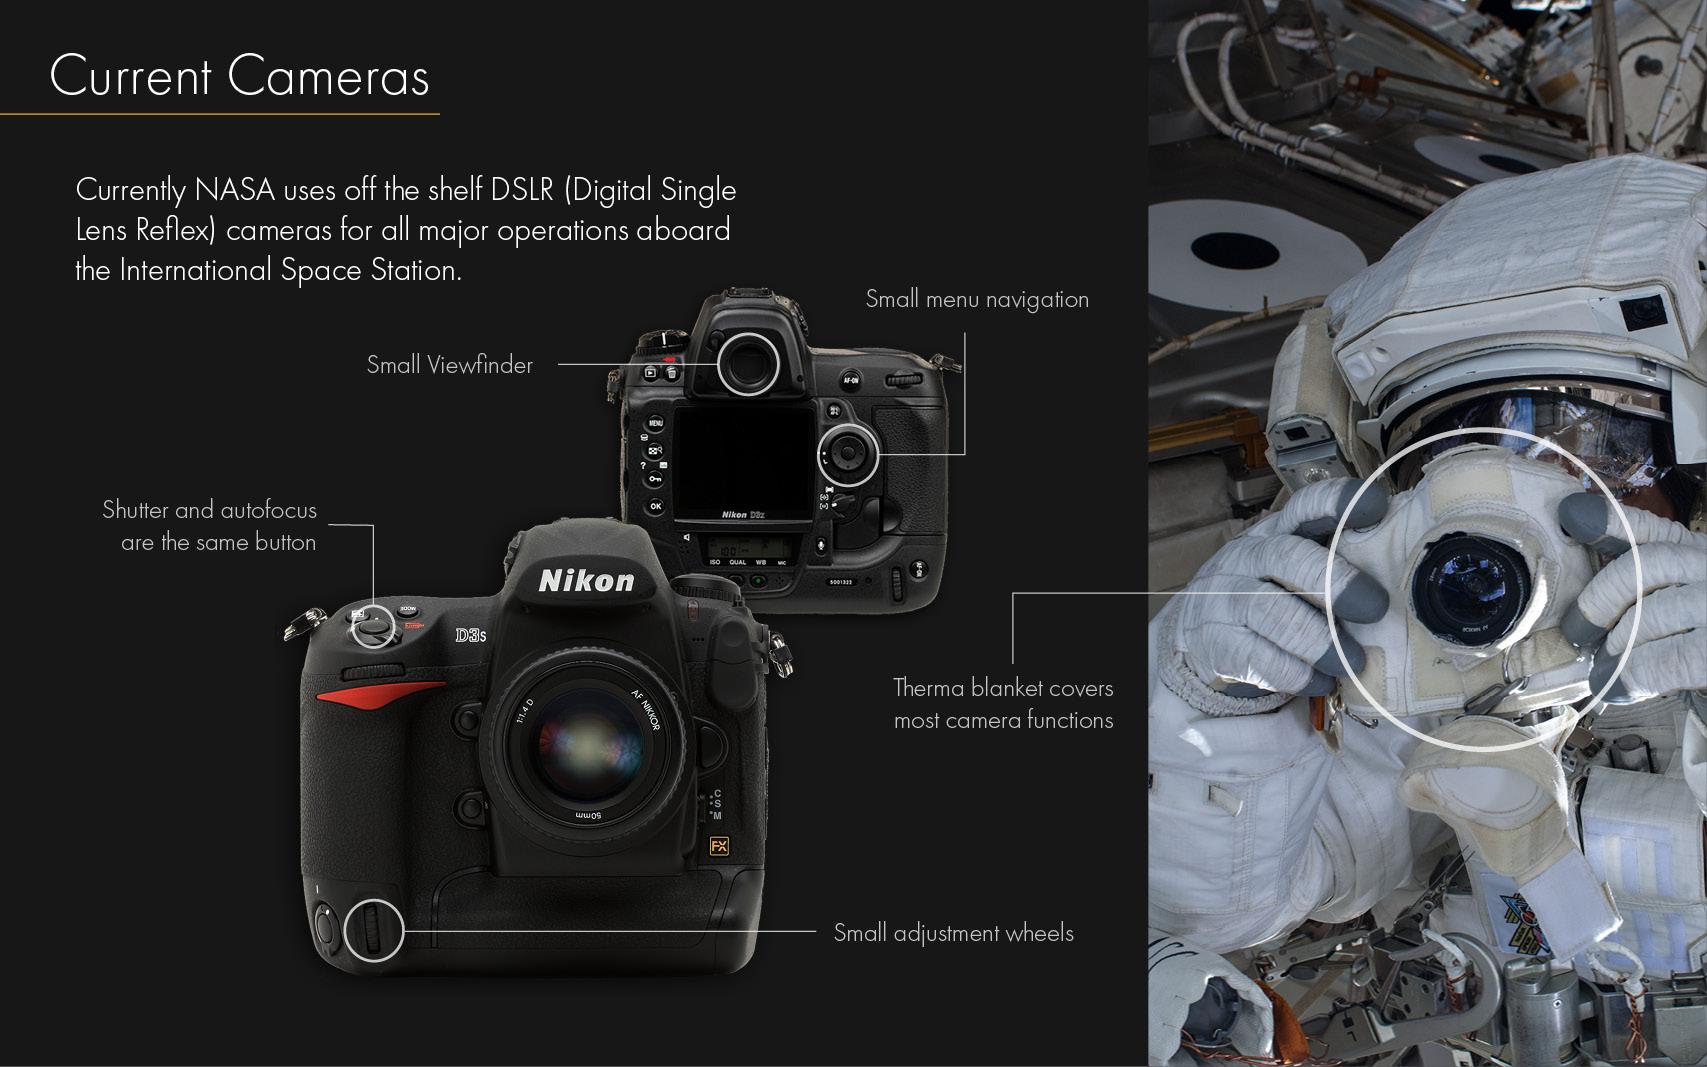 NikonDS5_Web3.jpg